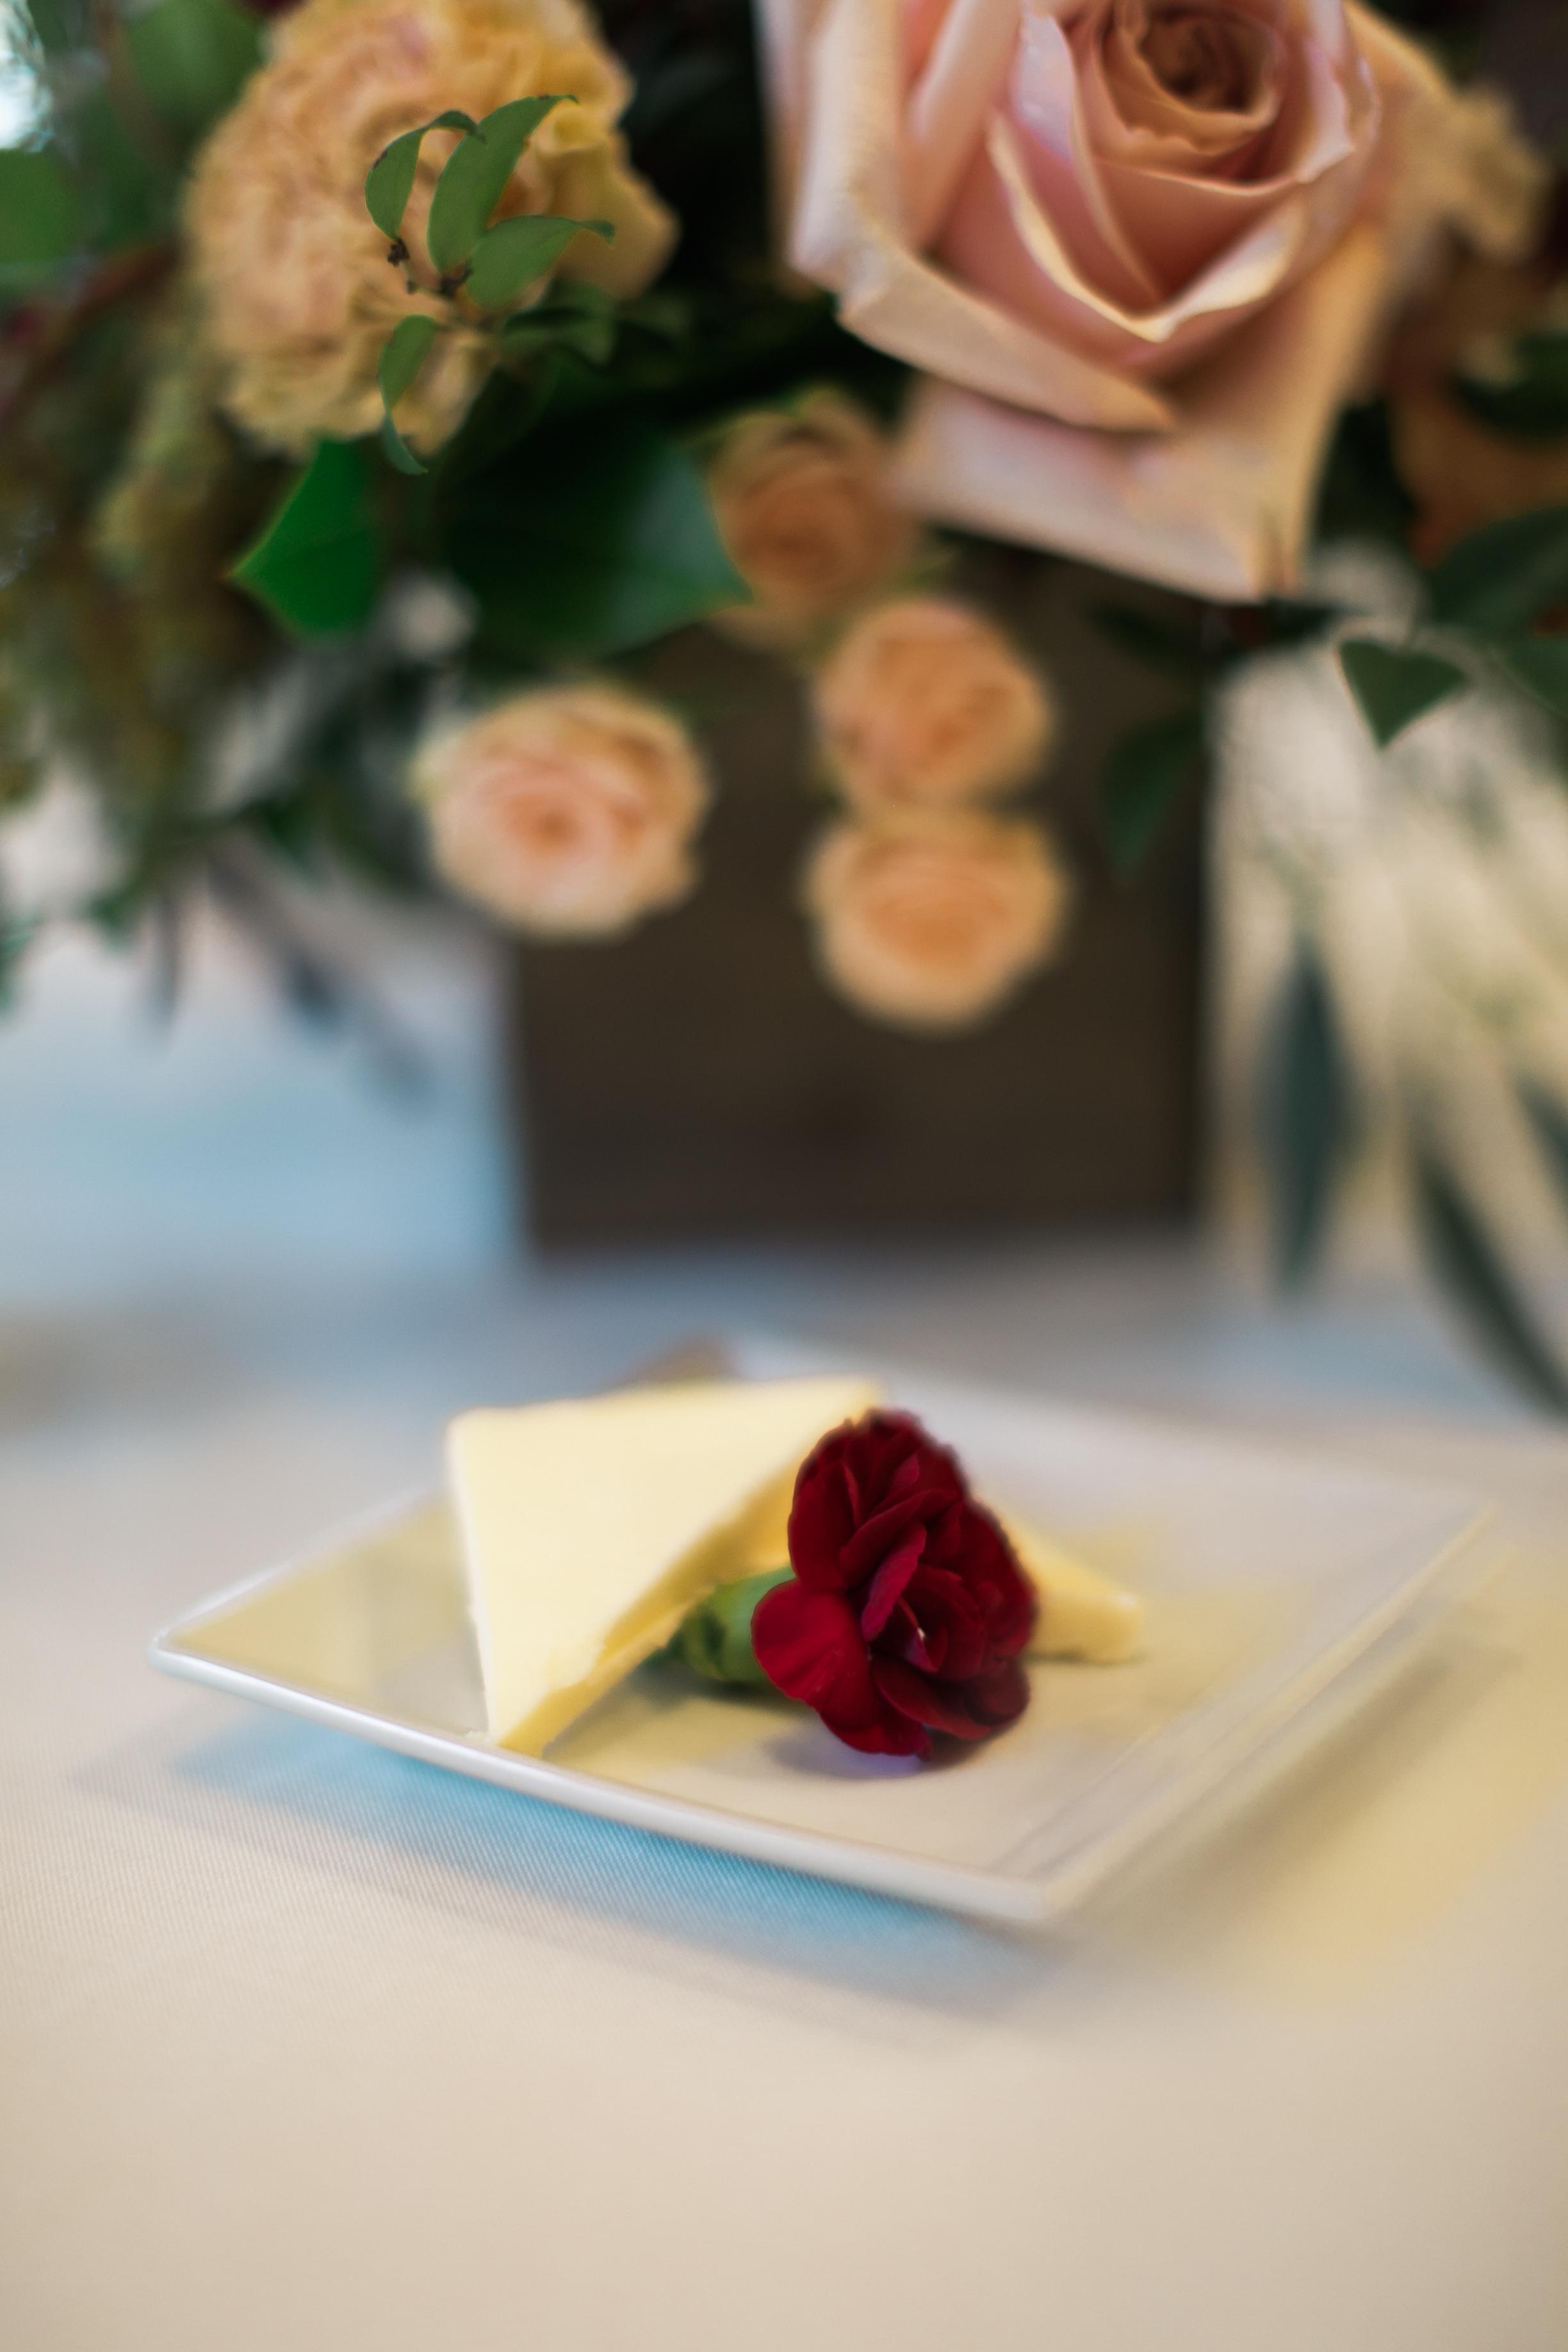 flower on butter plate